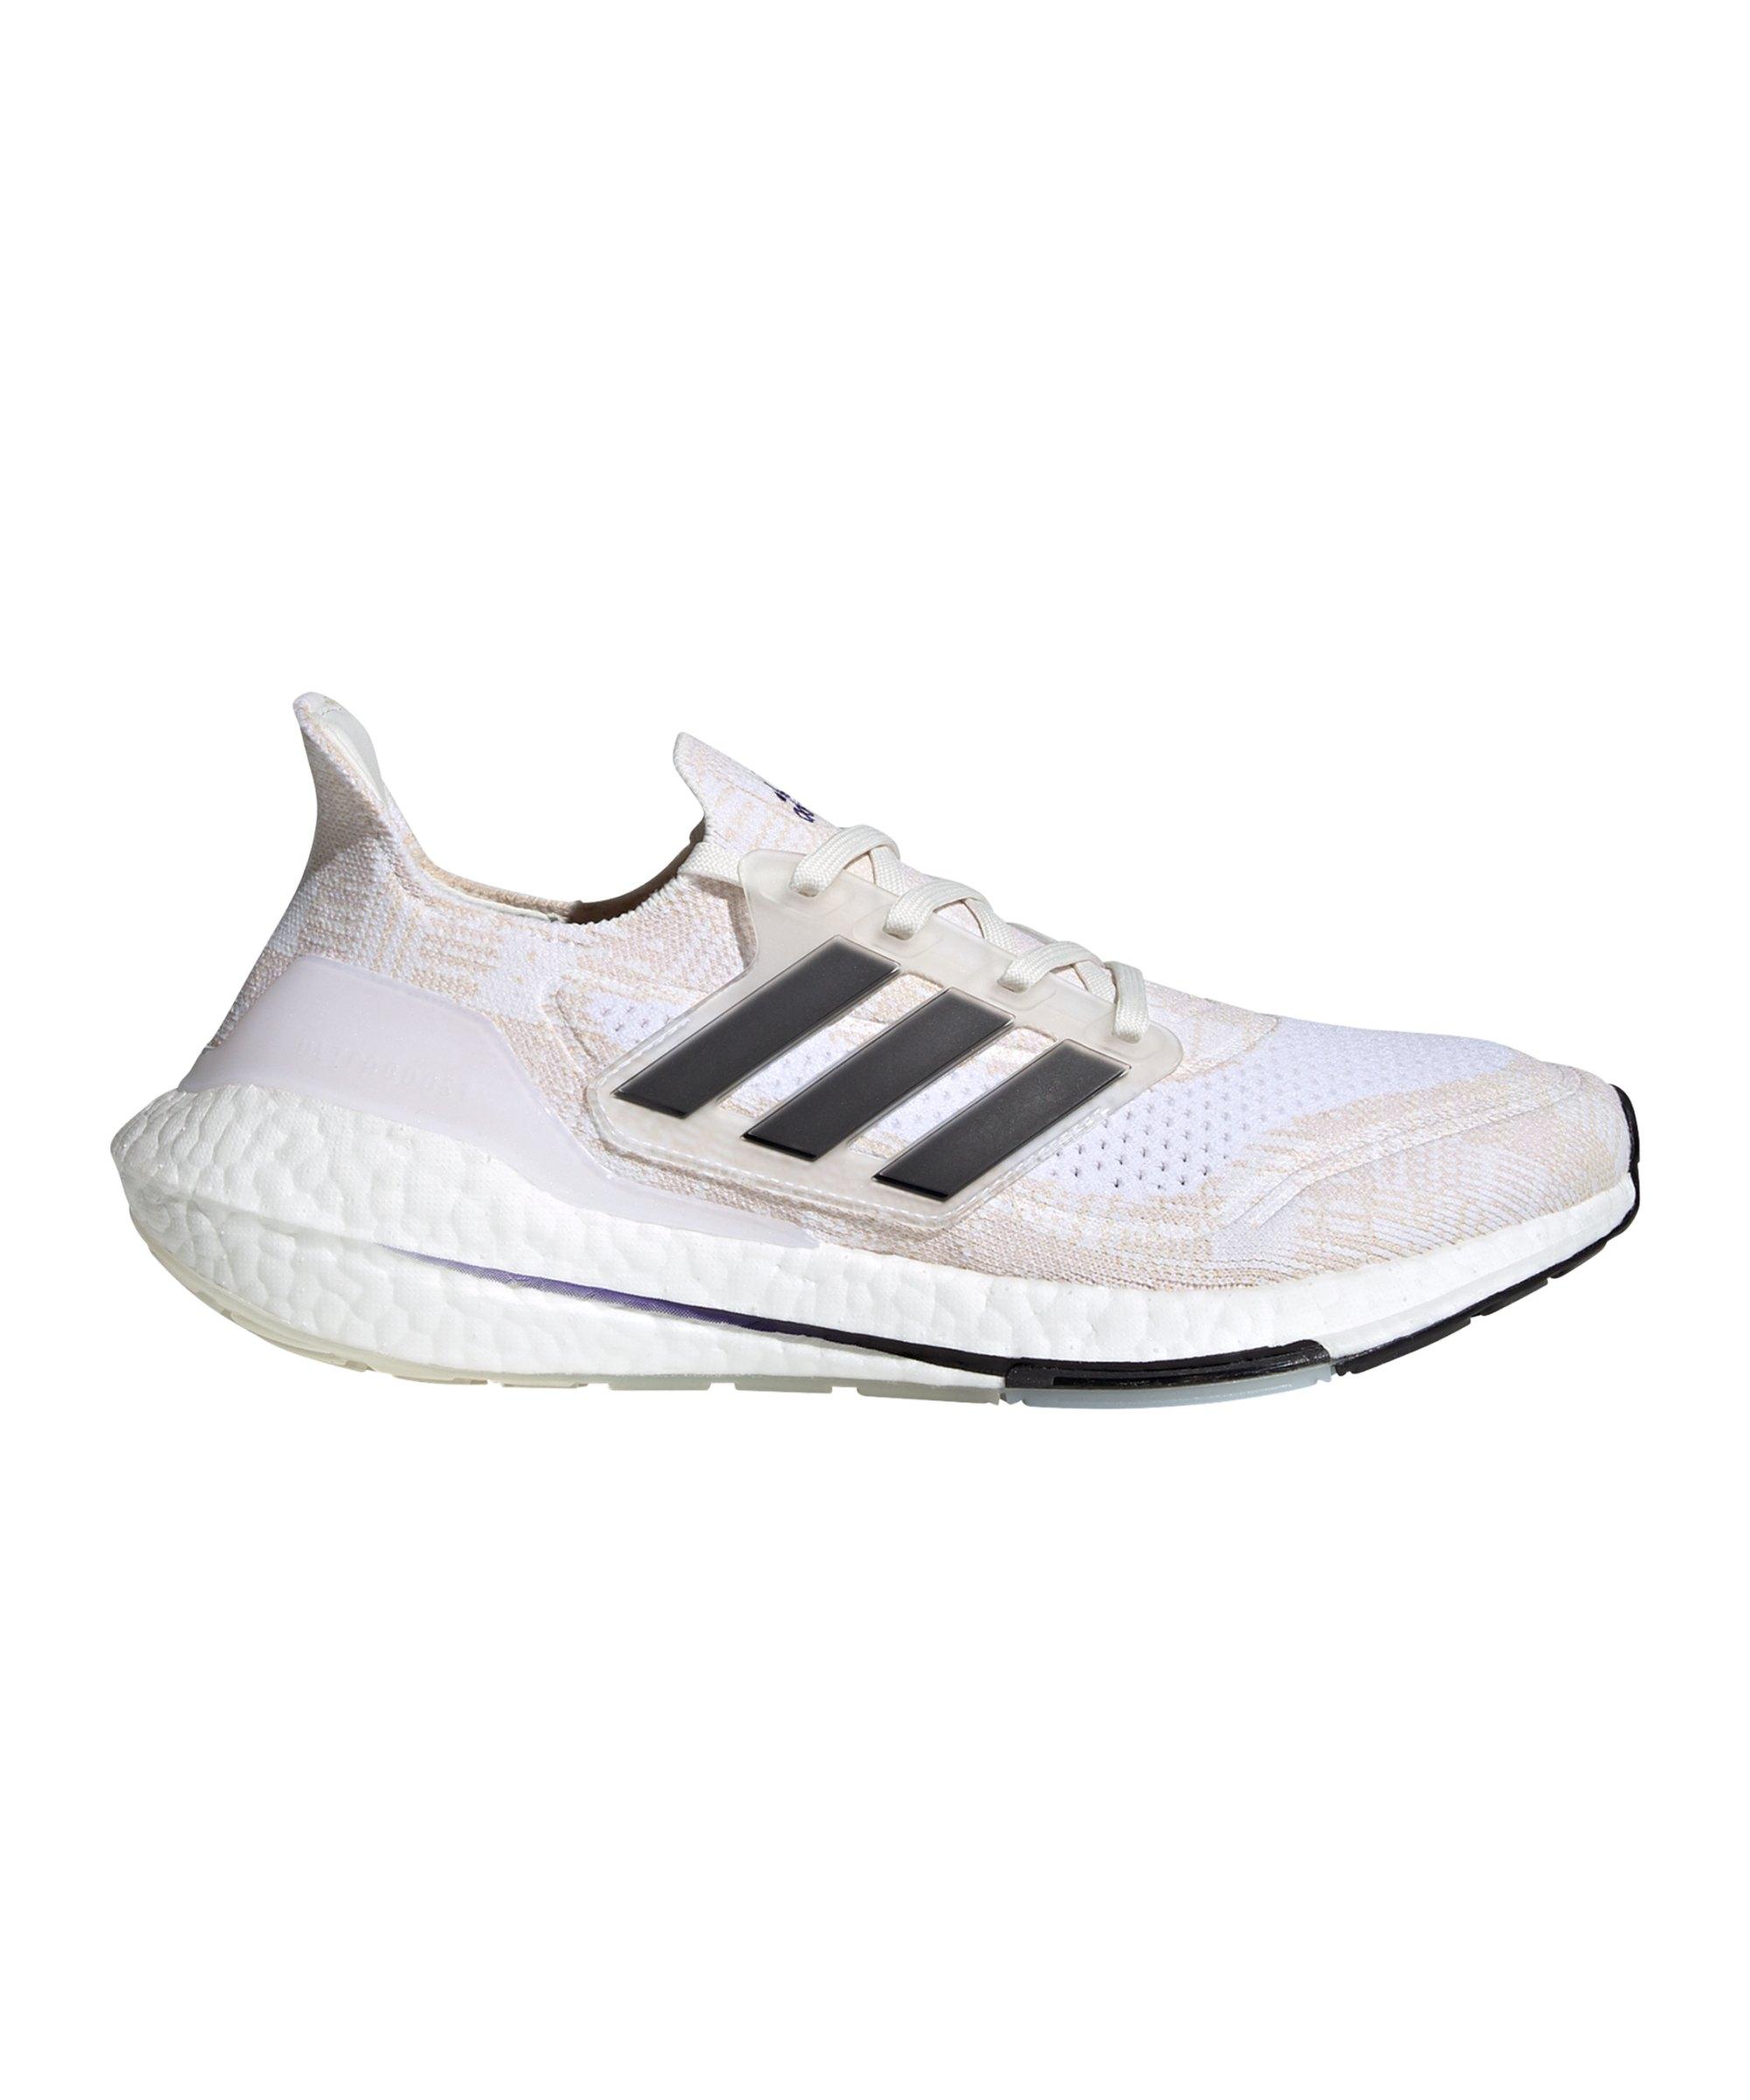 adidas Ultraboost 21 Primeblue Running Beige - beige